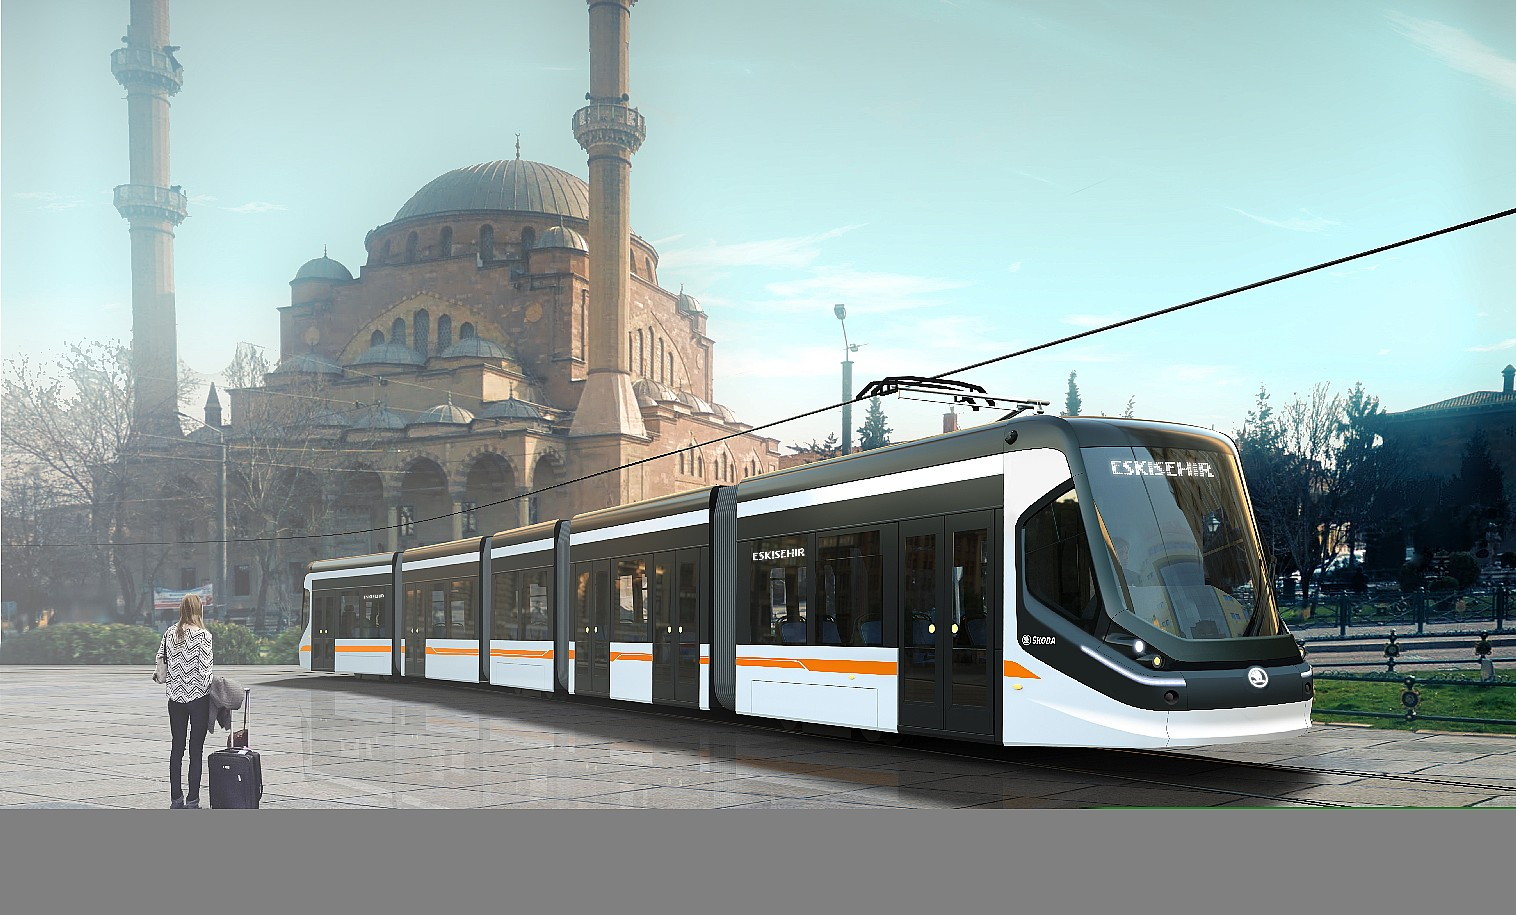 "Vzhled nové tramvaje pro turecké město Eskişehir. (zdroj: Škoda Transportation)                    Normal   0       21       false   false   false     CS   X-NONE   X-NONE                                                                                                                                                                                                                                                                                                                                                                                                                                                                                                                                                                                                                                                                                                                                                                                                                                                               /* Style Definitions */  table.MsoNormalTable {mso-style-name:""Normální tabulka""; mso-tstyle-rowband-size:0; mso-tstyle-colband-size:0; mso-style-noshow:yes; mso-style-priority:99; mso-style-parent:""""; mso-padding-alt:0cm 5.4pt 0cm 5.4pt; mso-para-margin:0cm; mso-para-margin-bottom:.0001pt; text-align:justify; mso-pagination:widow-orphan; font-size:11.0pt; font-family:""Calibri"",sans-serif; mso-ascii-font-family:Calibri; mso-ascii-theme-font:minor-latin; mso-hansi-font-family:Calibri; mso-hansi-theme-font:minor-latin; mso-fareast-language:EN-US;}"